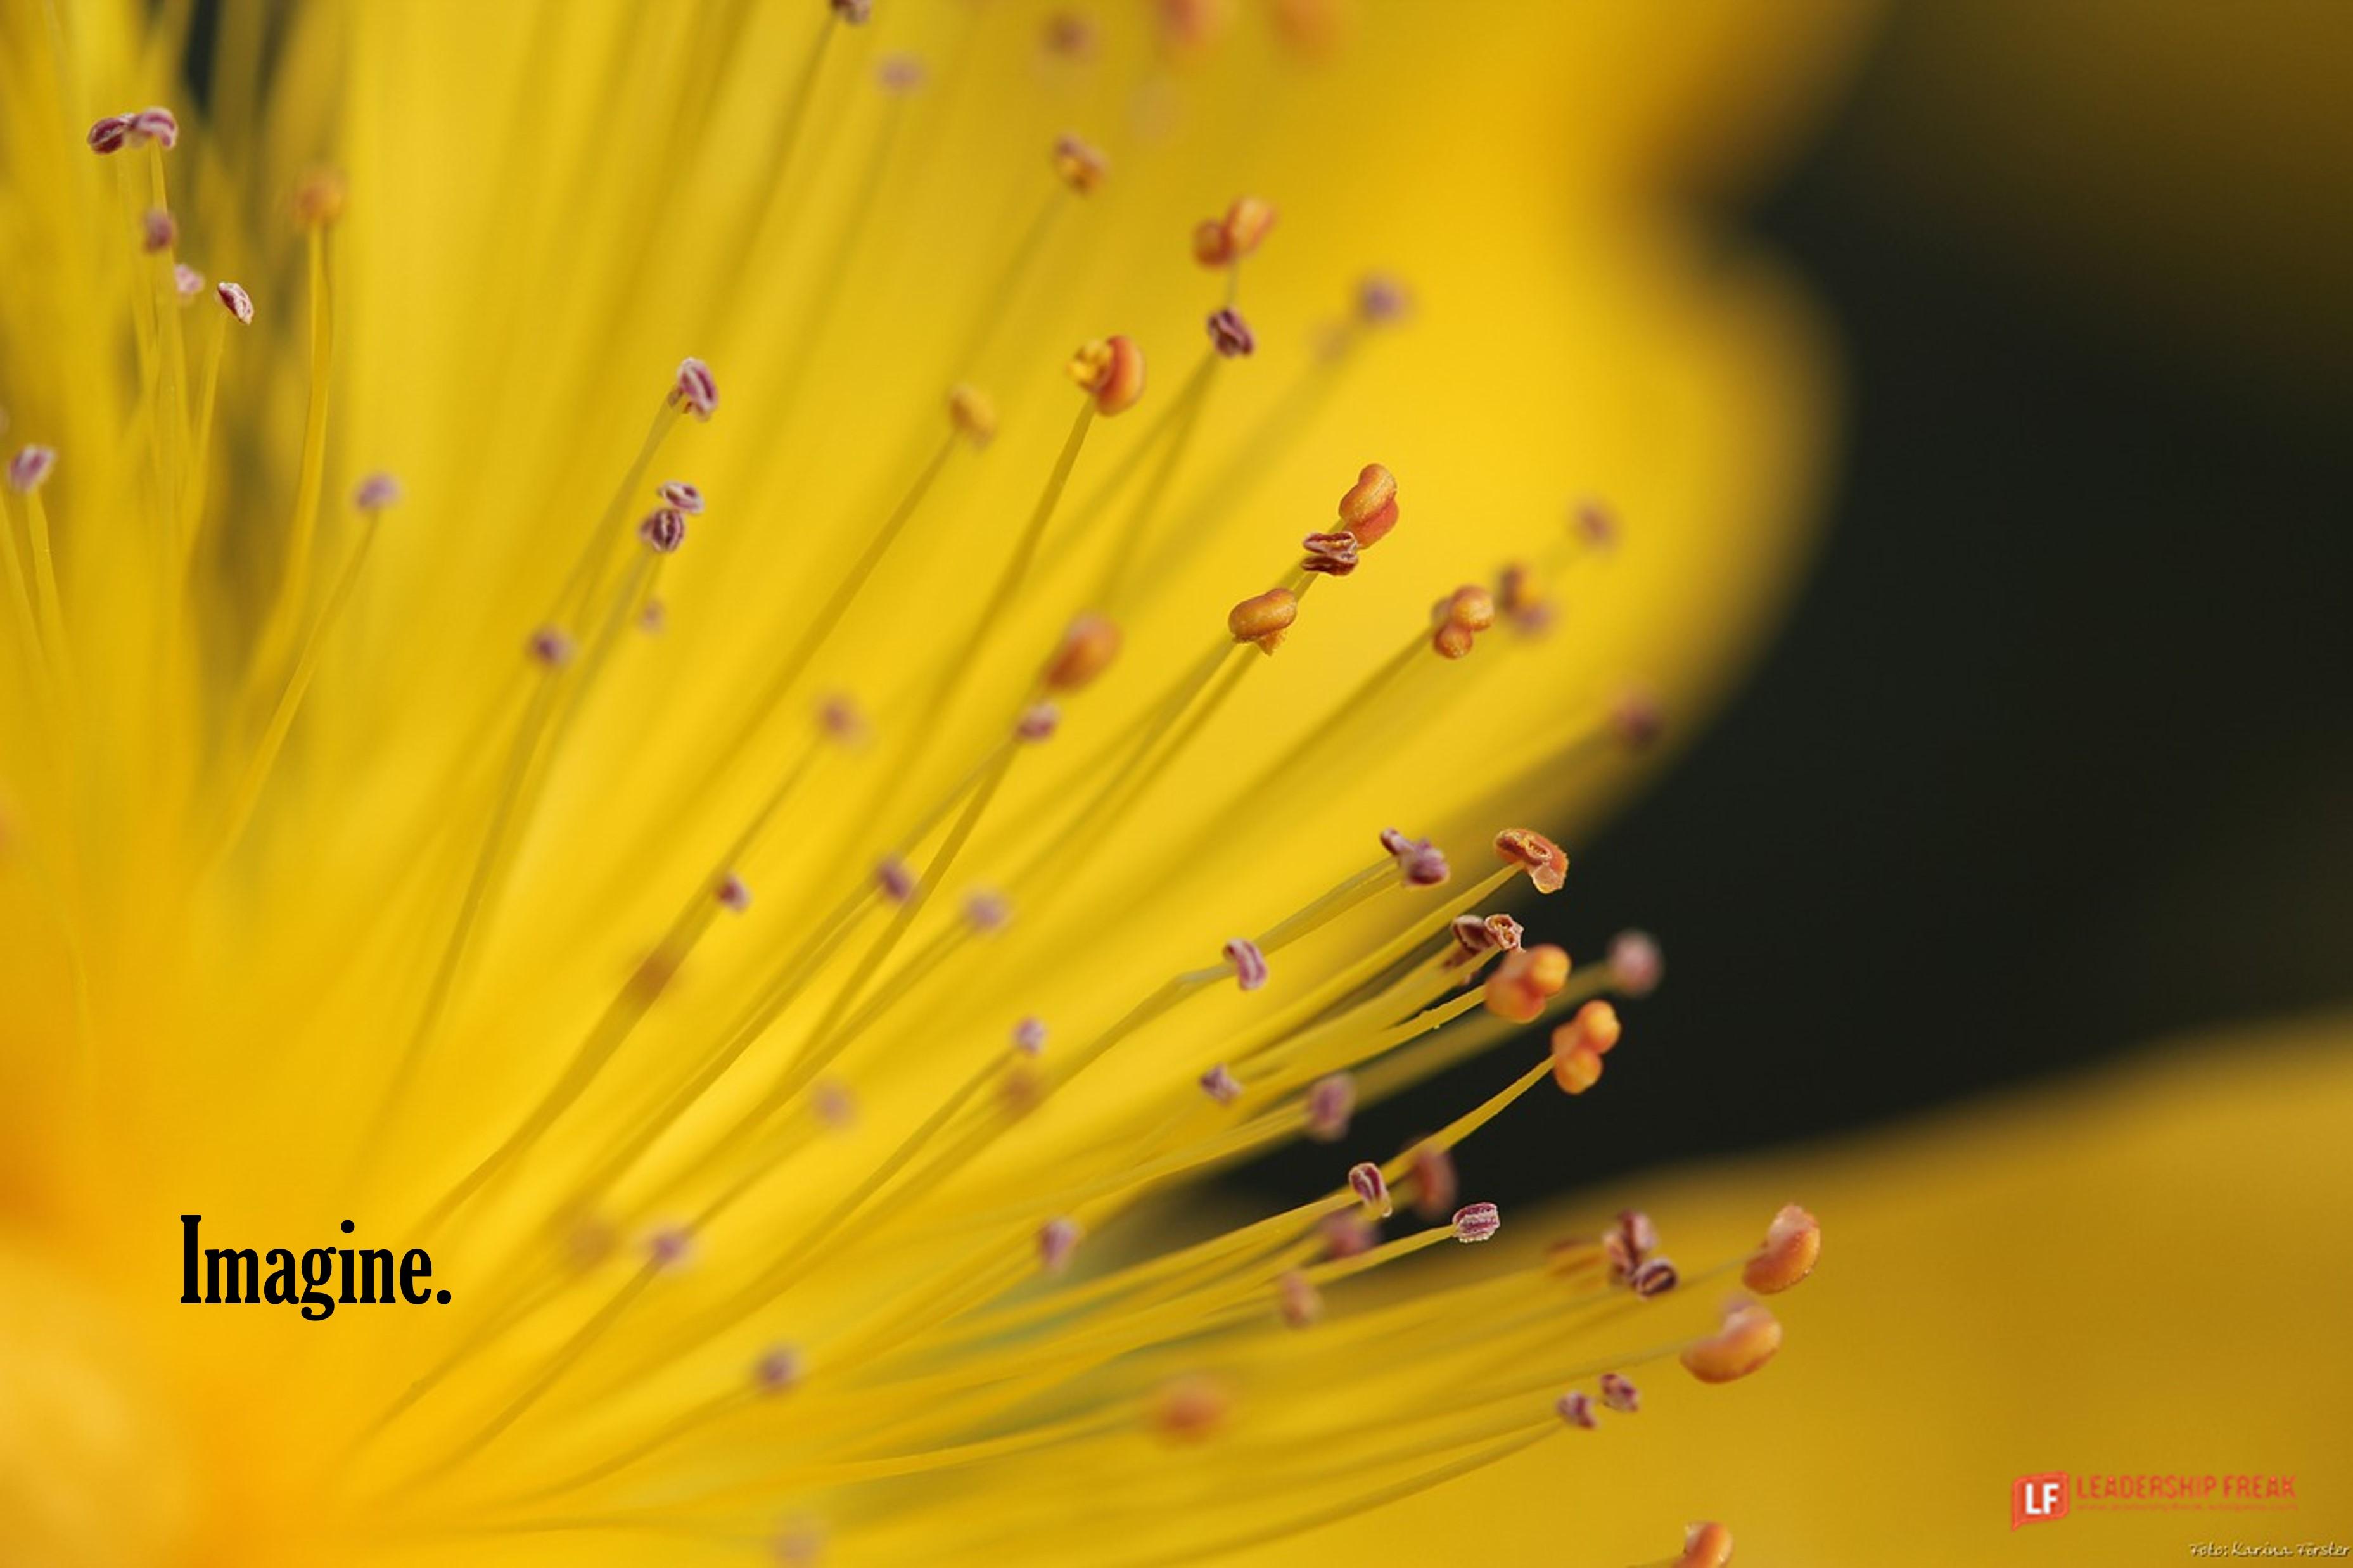 Closeup of yellow flower.  Imagine.